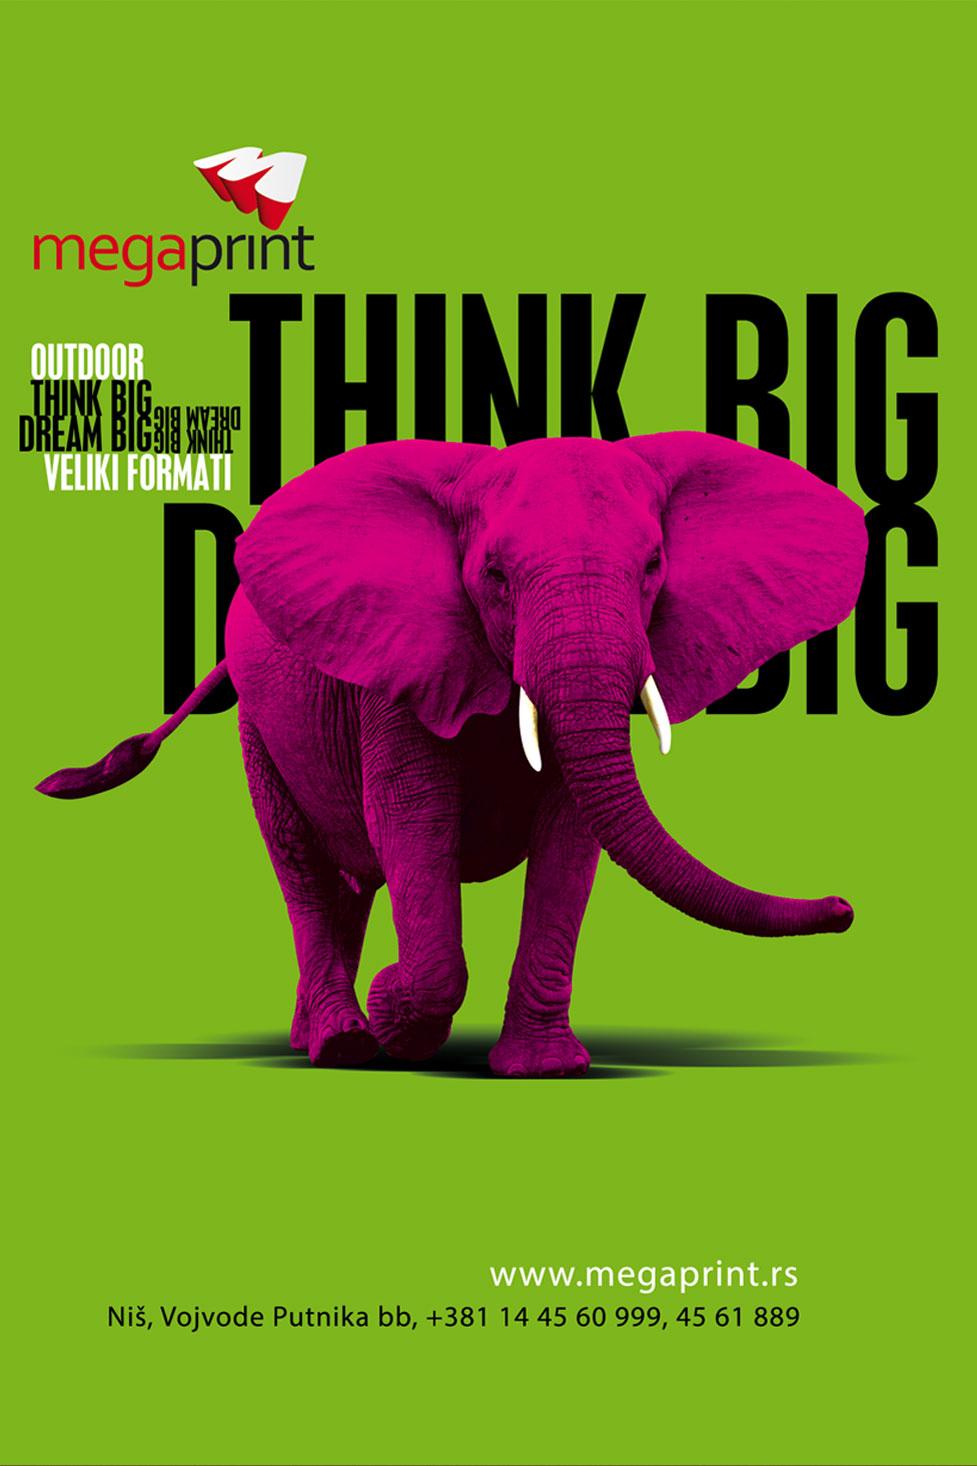 mega print poster 2